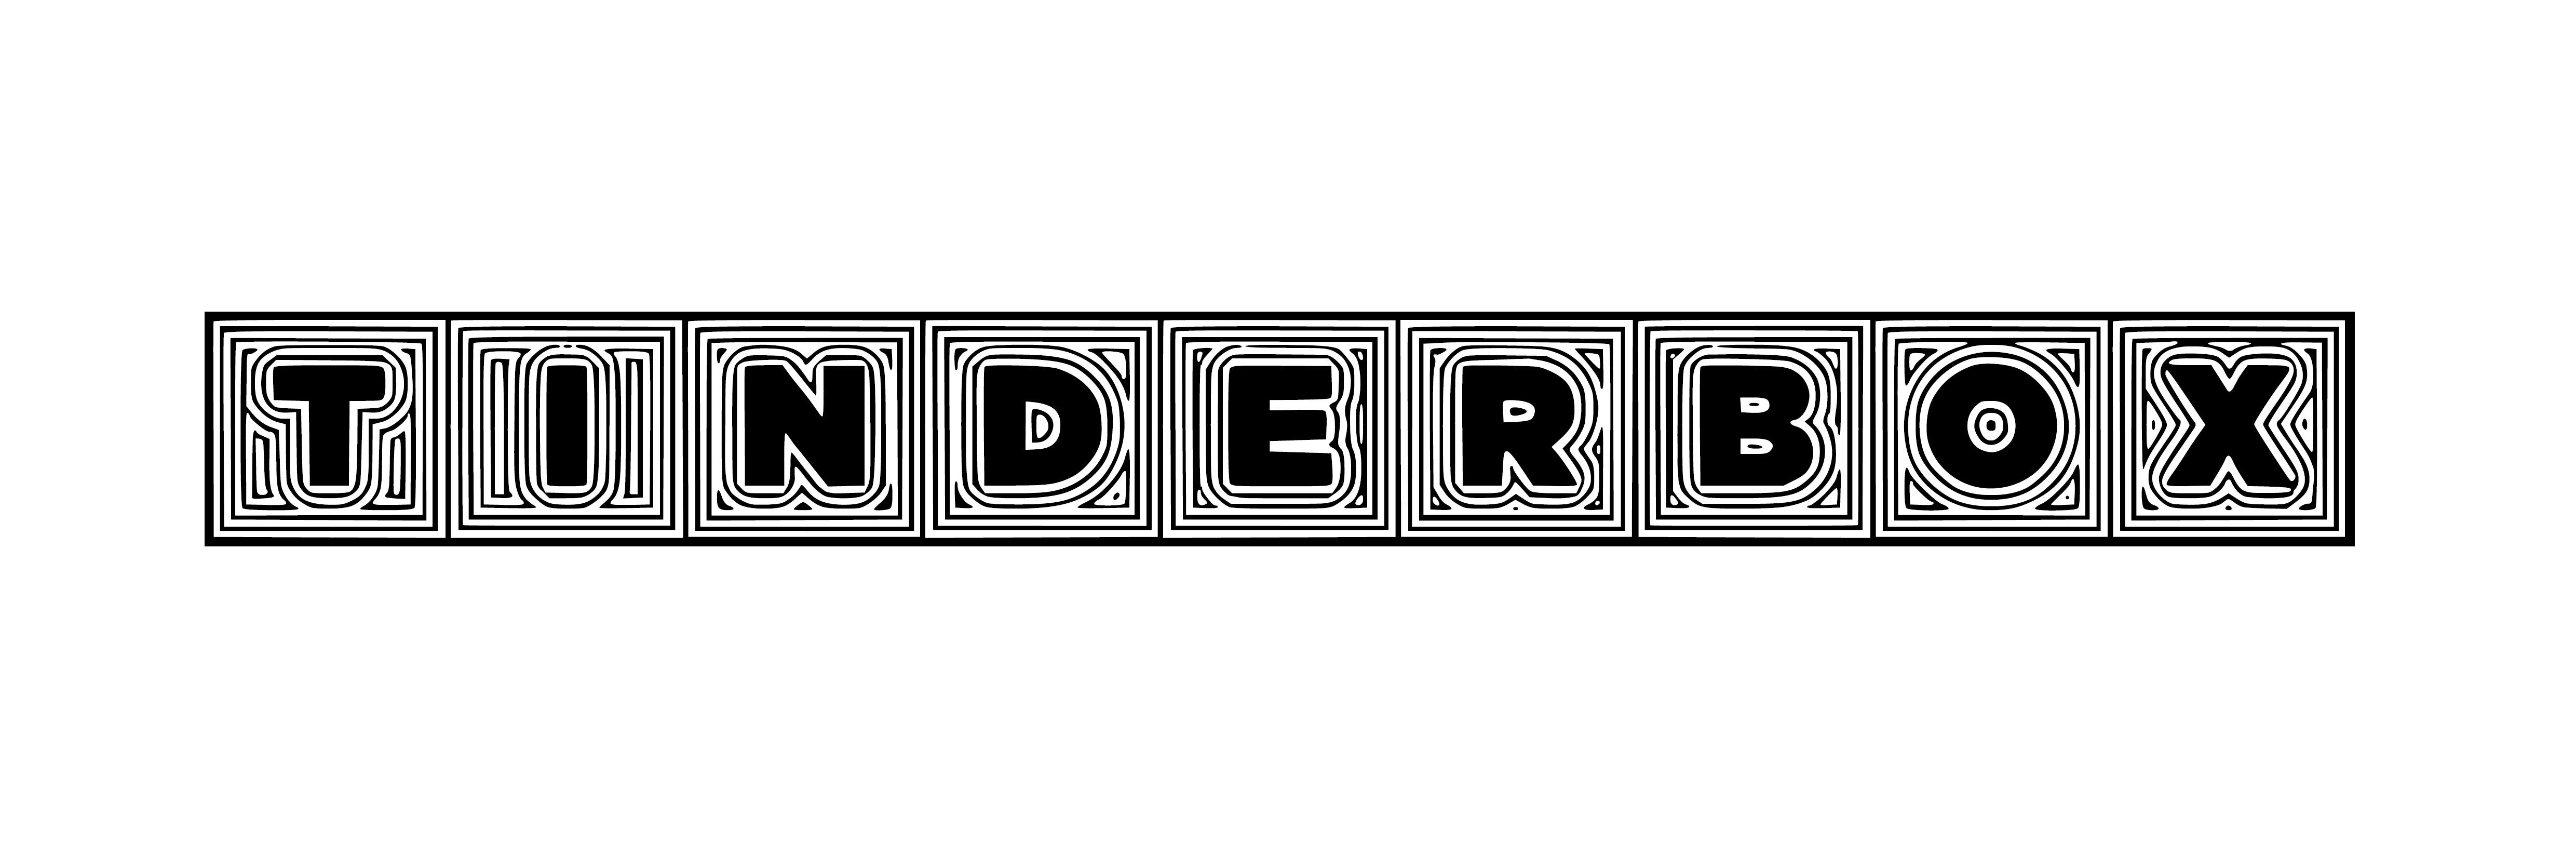 TINDERBOX BANNER BLACK ON WHITE